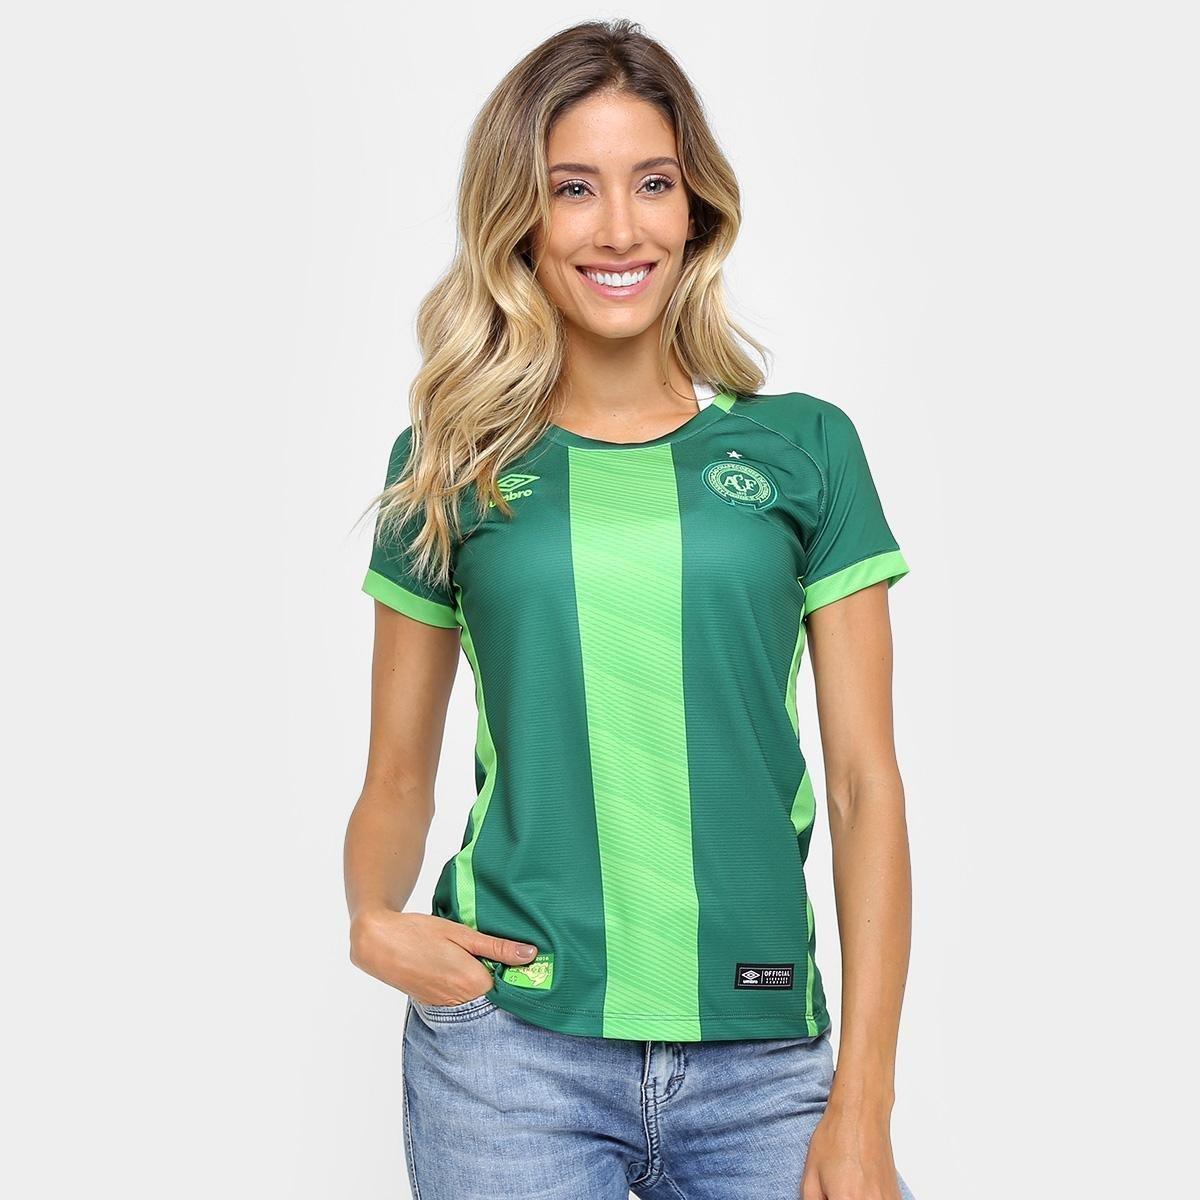 6134f13012a57 Camisa Chapecoense III 16/17 s/nº Torcedor Umbro Feminina | Loja da Chape